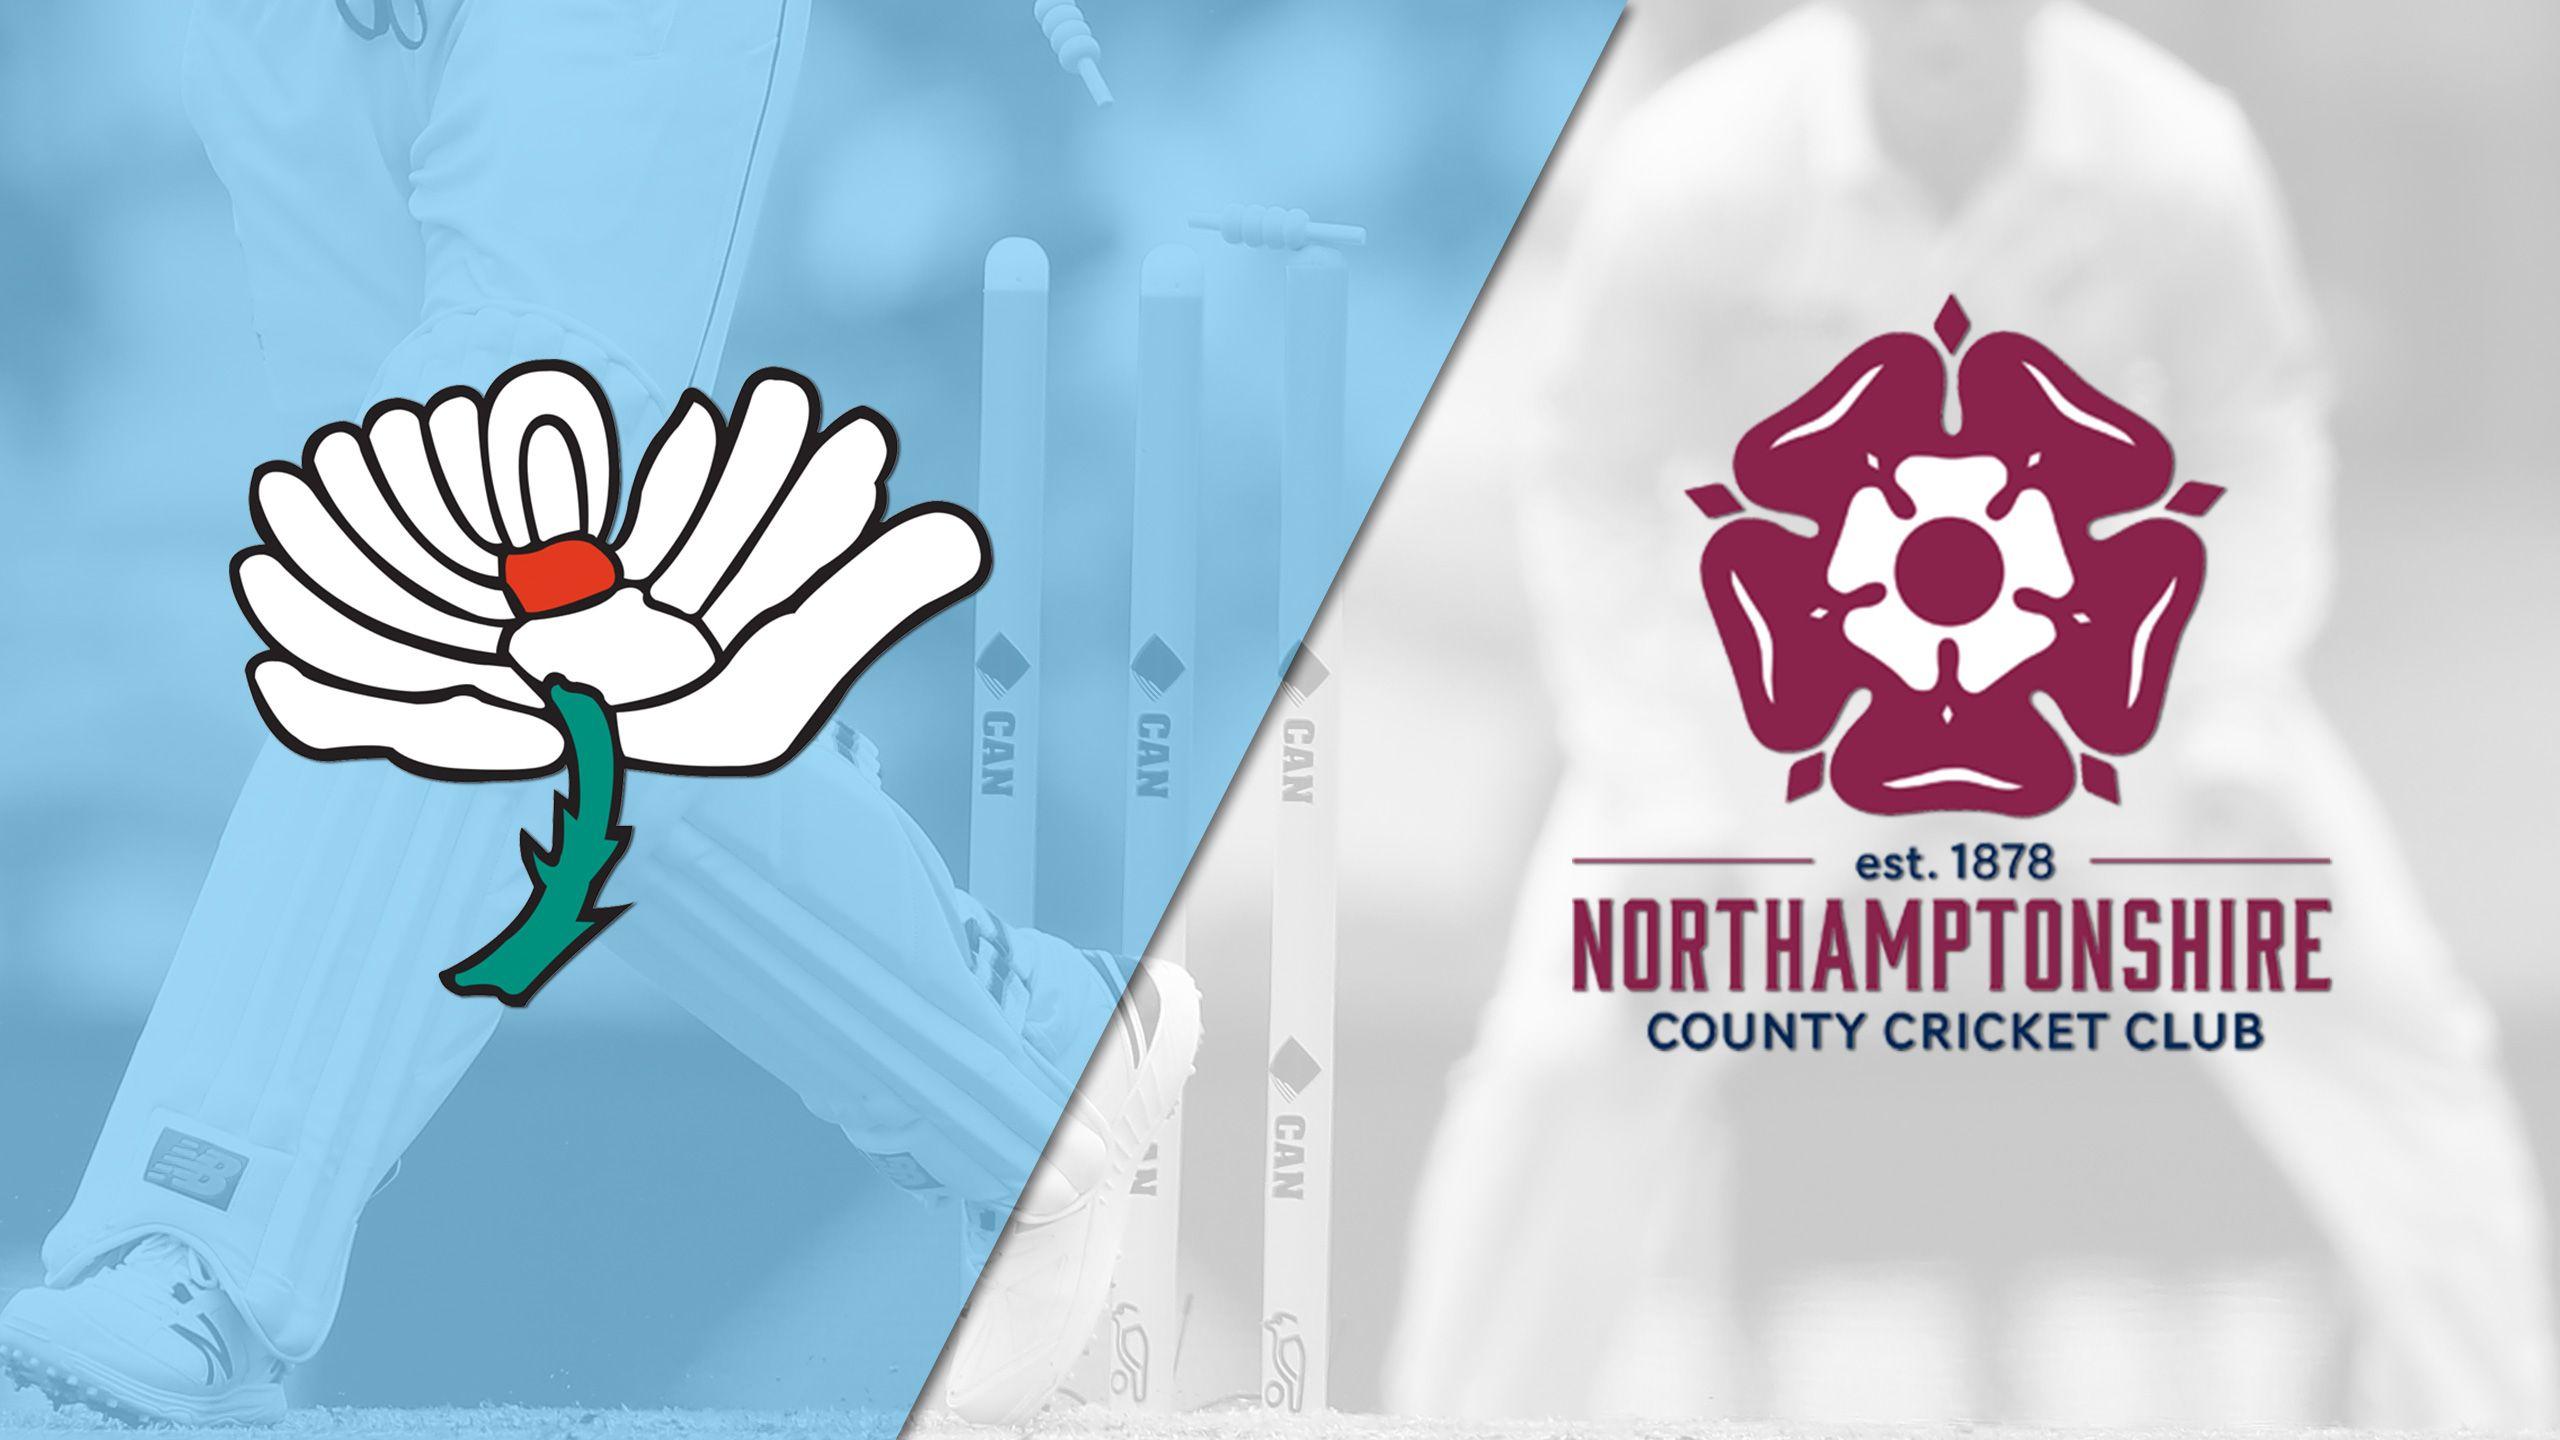 Yorkshire vs. Northamptonshire (NatWest T20 Blast)